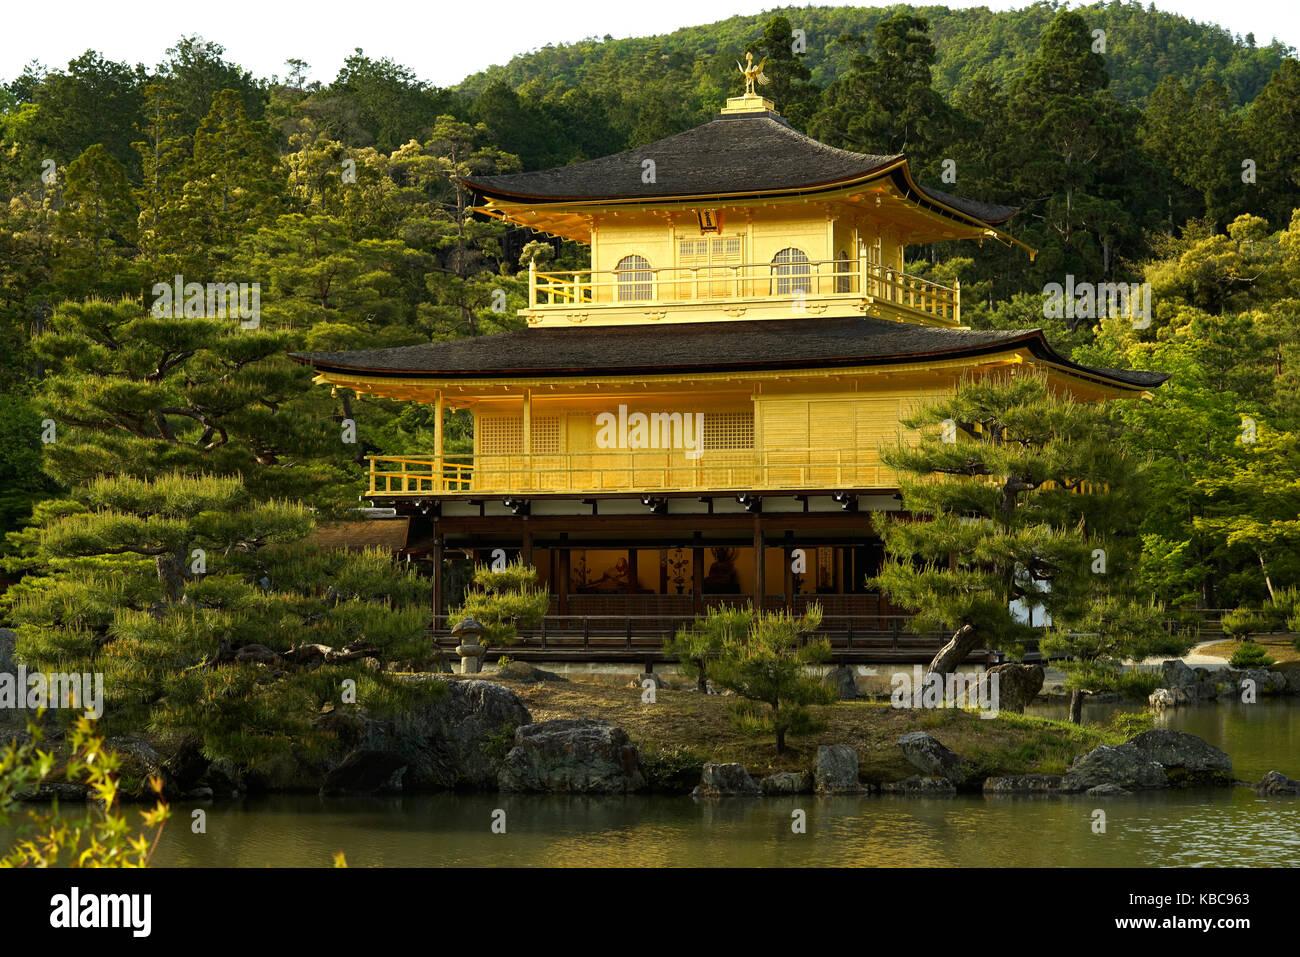 Buddhist Japanese Zen Garden In Botanical Garden Stock Photos ...